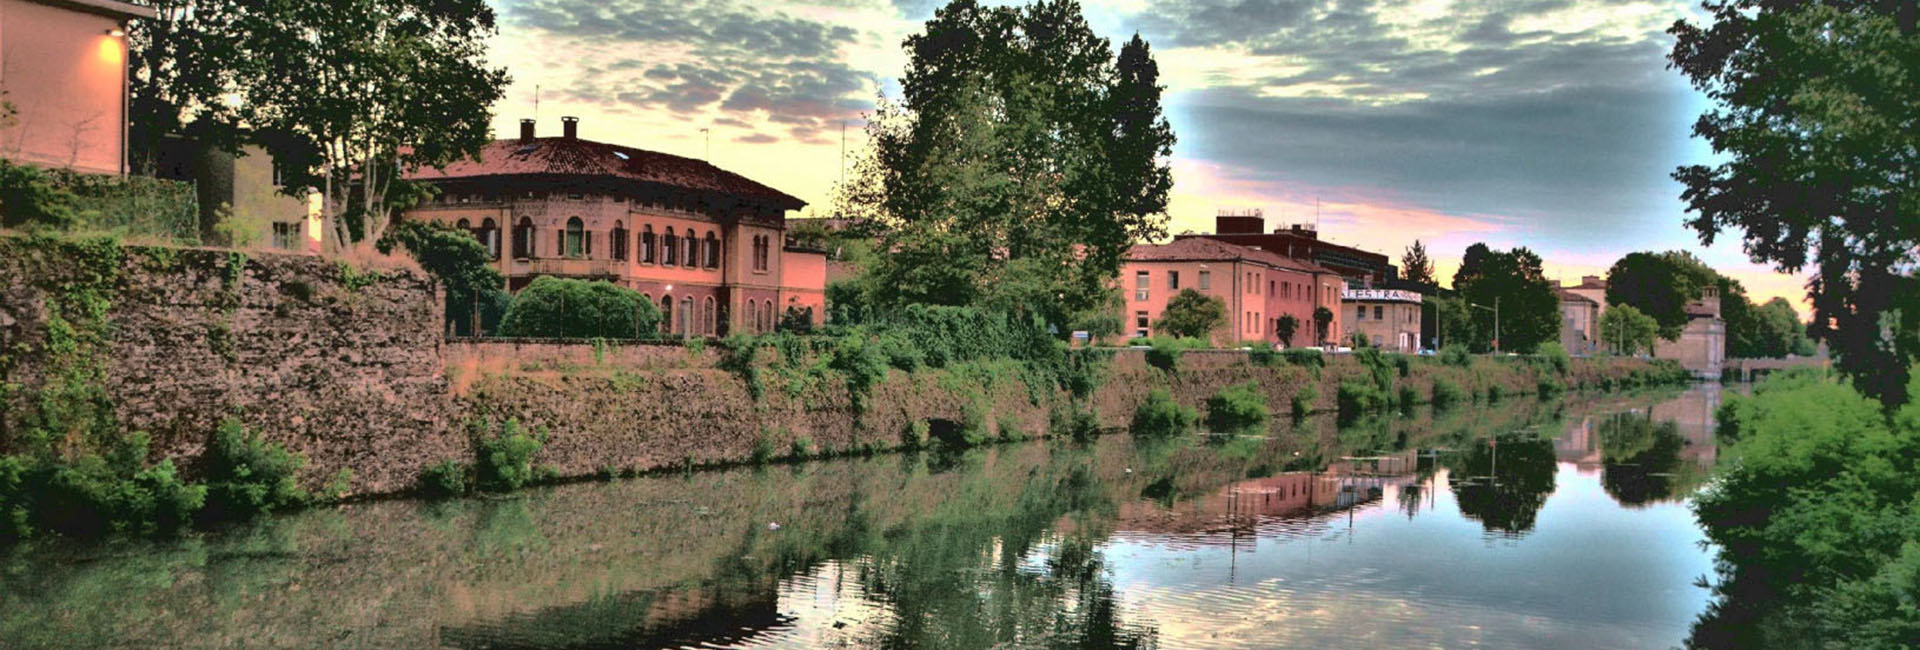 Padova Travel Vie d'acqua ©Corinto Baliello